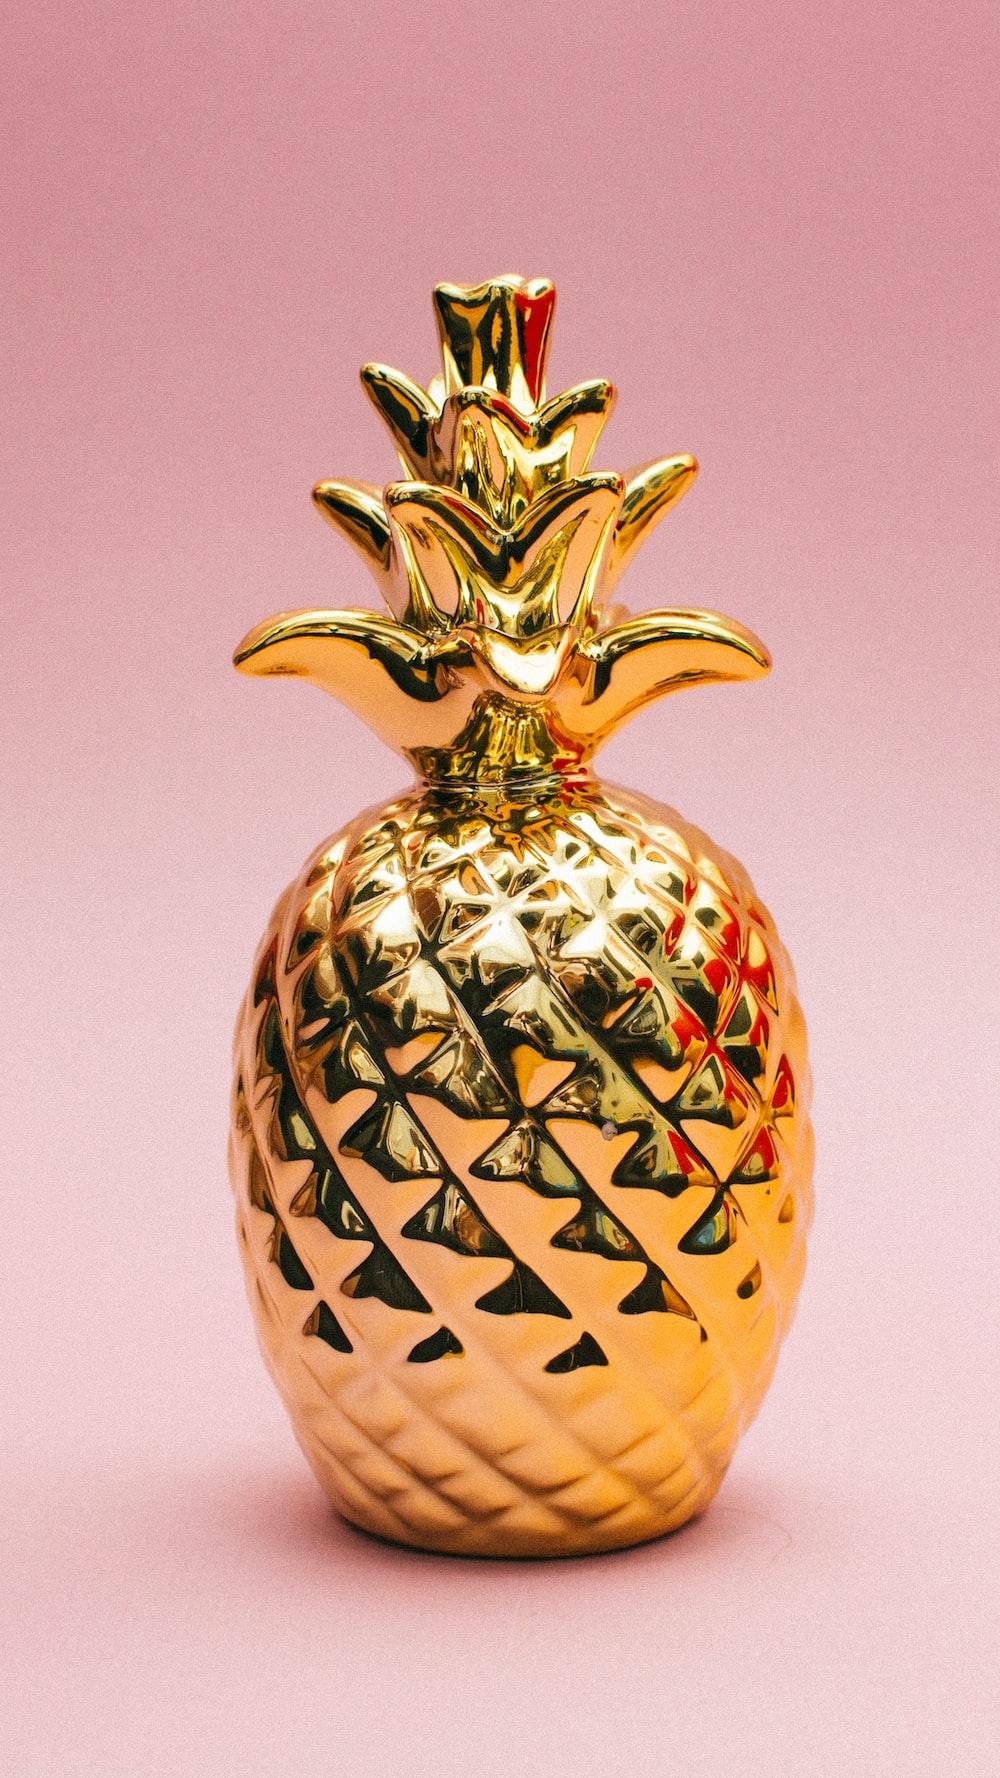 gold pineapple decor